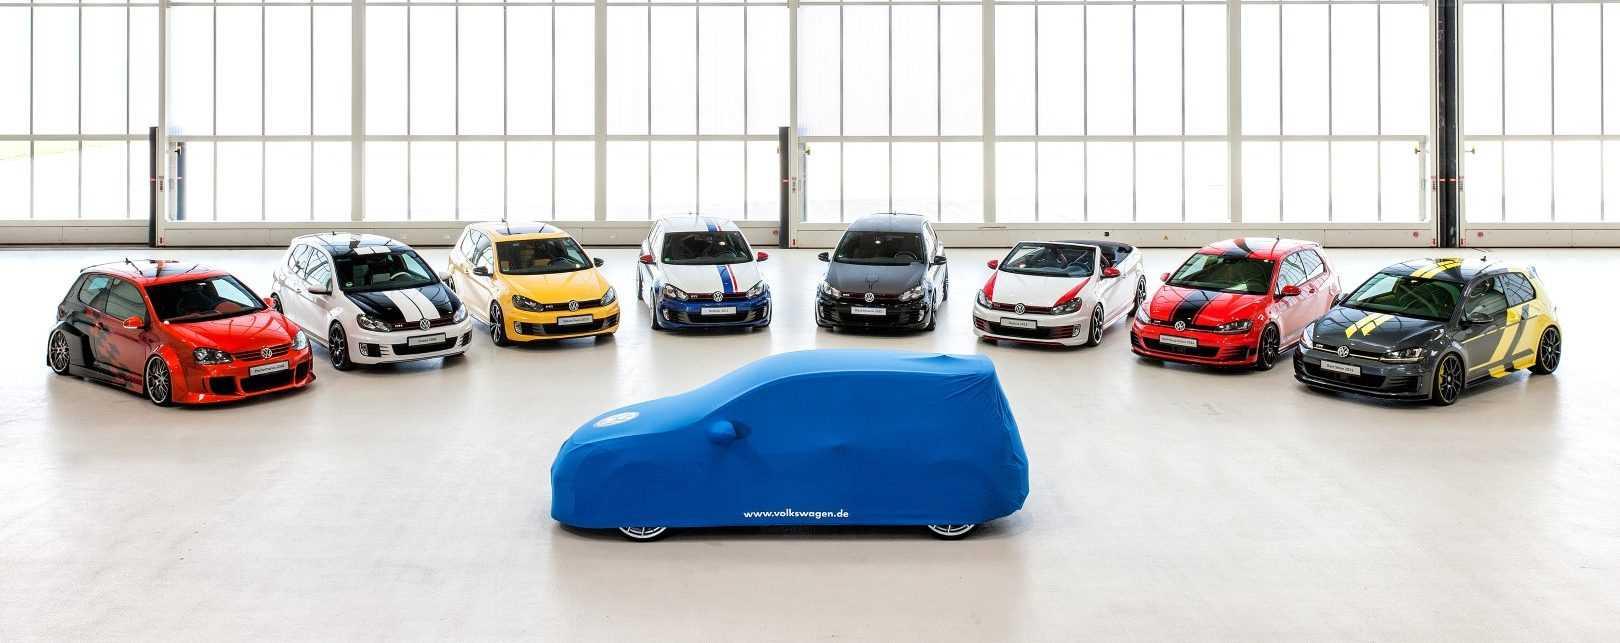 Volkswagen GTI-Treffen 2016